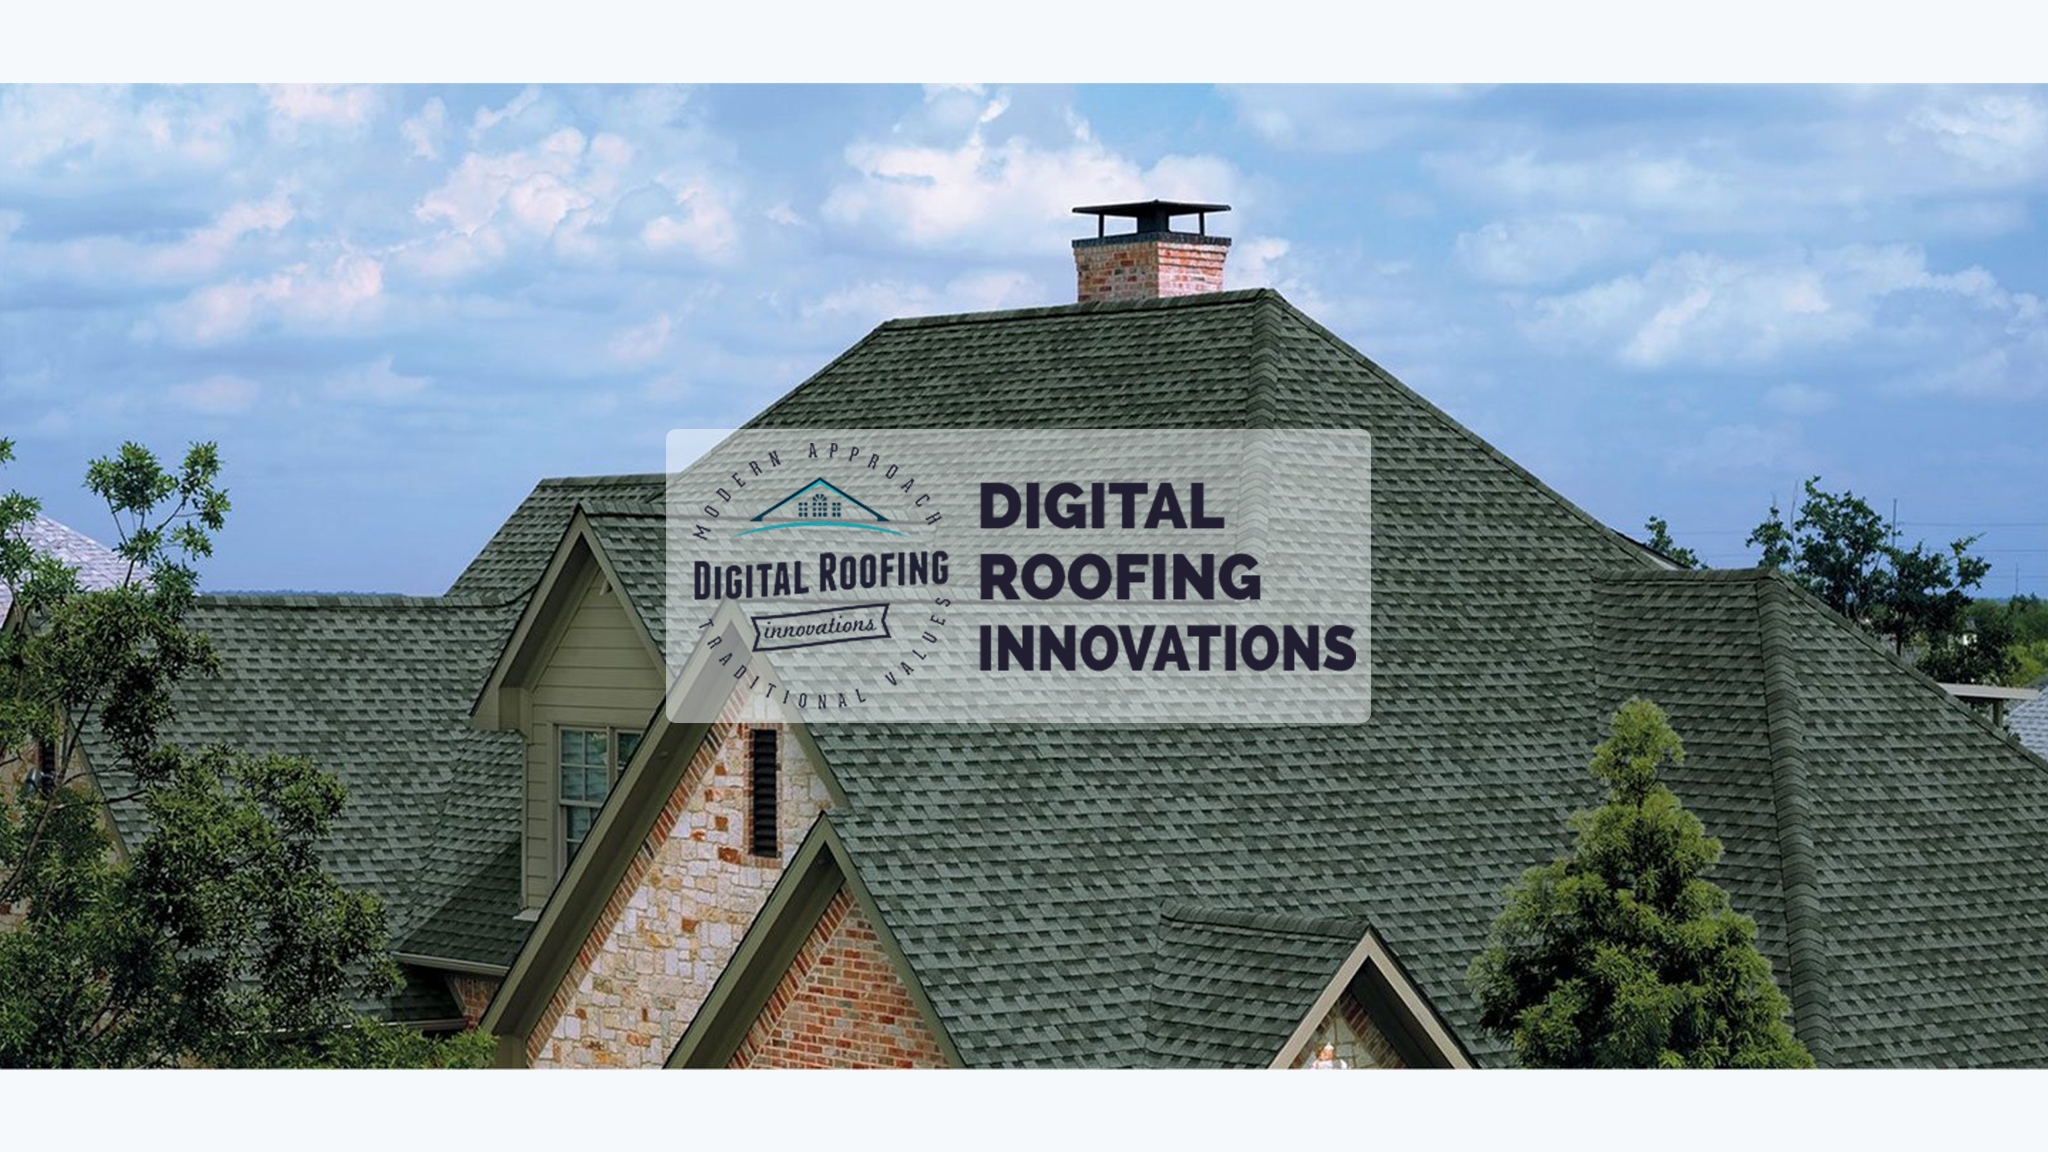 DigitalRoofing (@digitalroofing) Cover Image